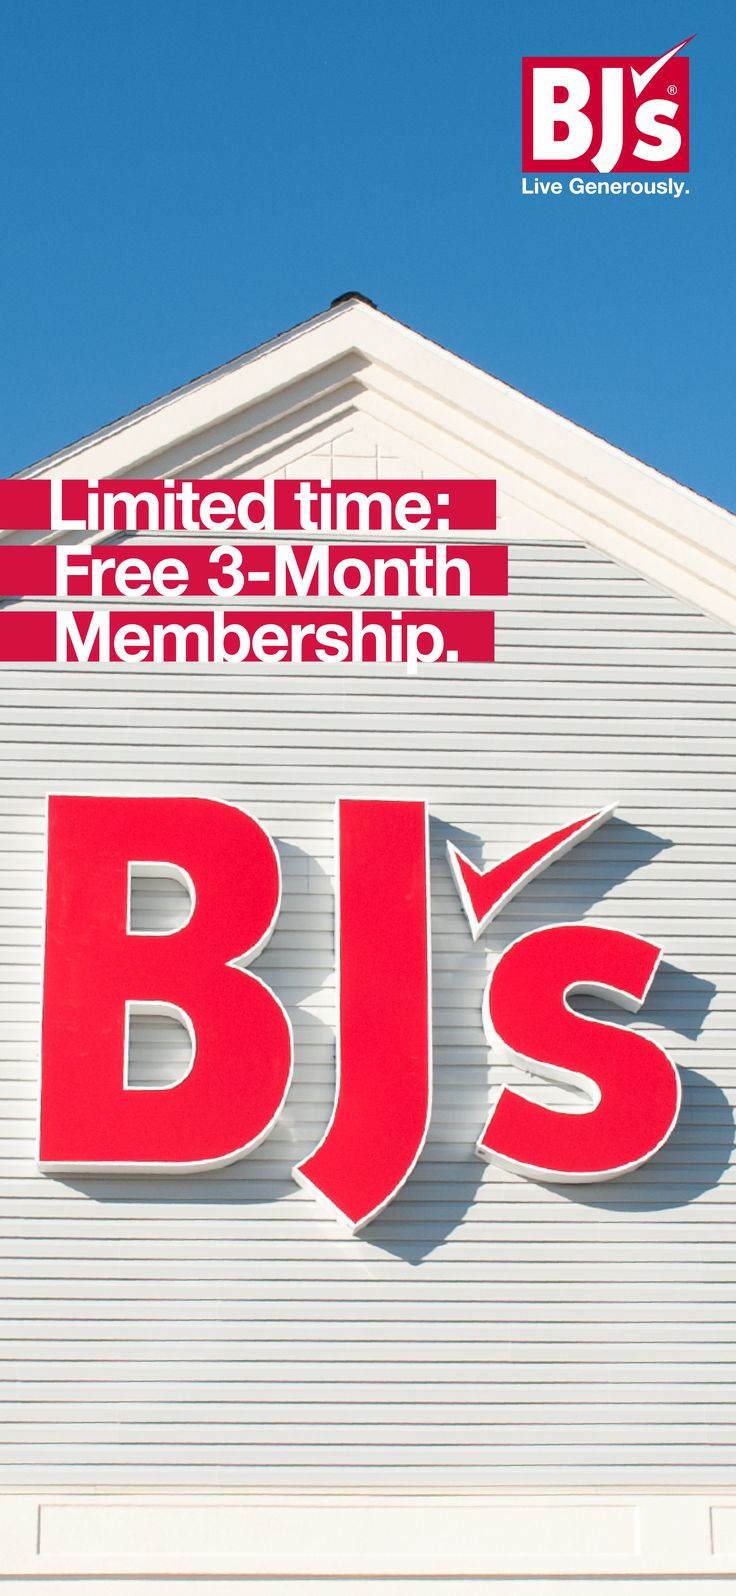 Sign up! Get a free 3-Month Membership now and save up to 25% off grocery store prices.   http://www.bjs.com/webapp/wcs/stores/servlet/PurchaseTrialMembership?storeId=10201&langId=-1&catalogId=10201&memberType=innercircle&isRewards=N&marketCode=ZK0417&cm_mmc=SpringMAP2017-_-SocialFulcrum-_-Pinterest-_-April/&utm_source=Pinterest&utm_medium=28.10P